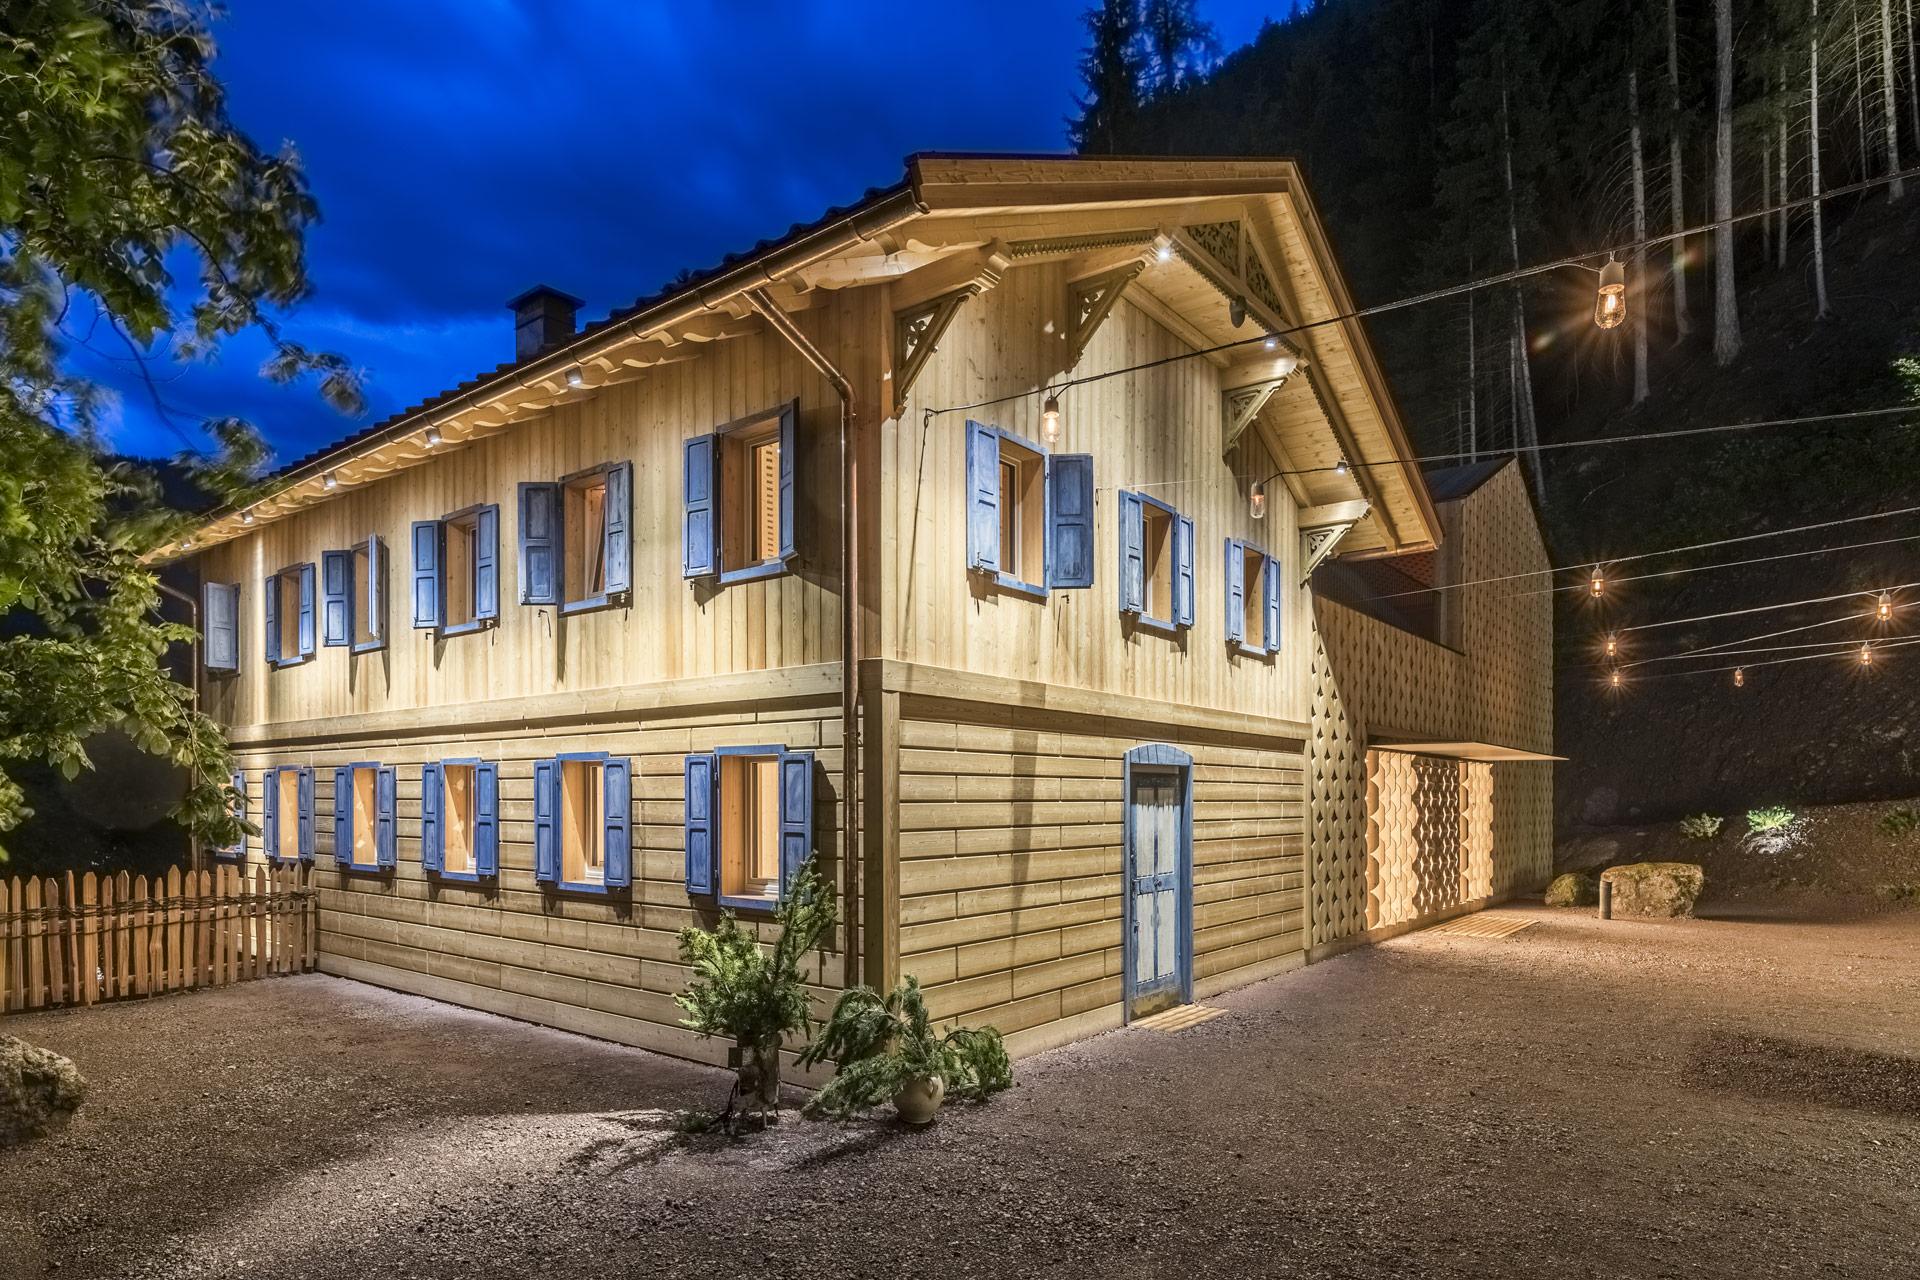 Bad Schörgau | Sarntal (BZ) - » Weddings » Private Events